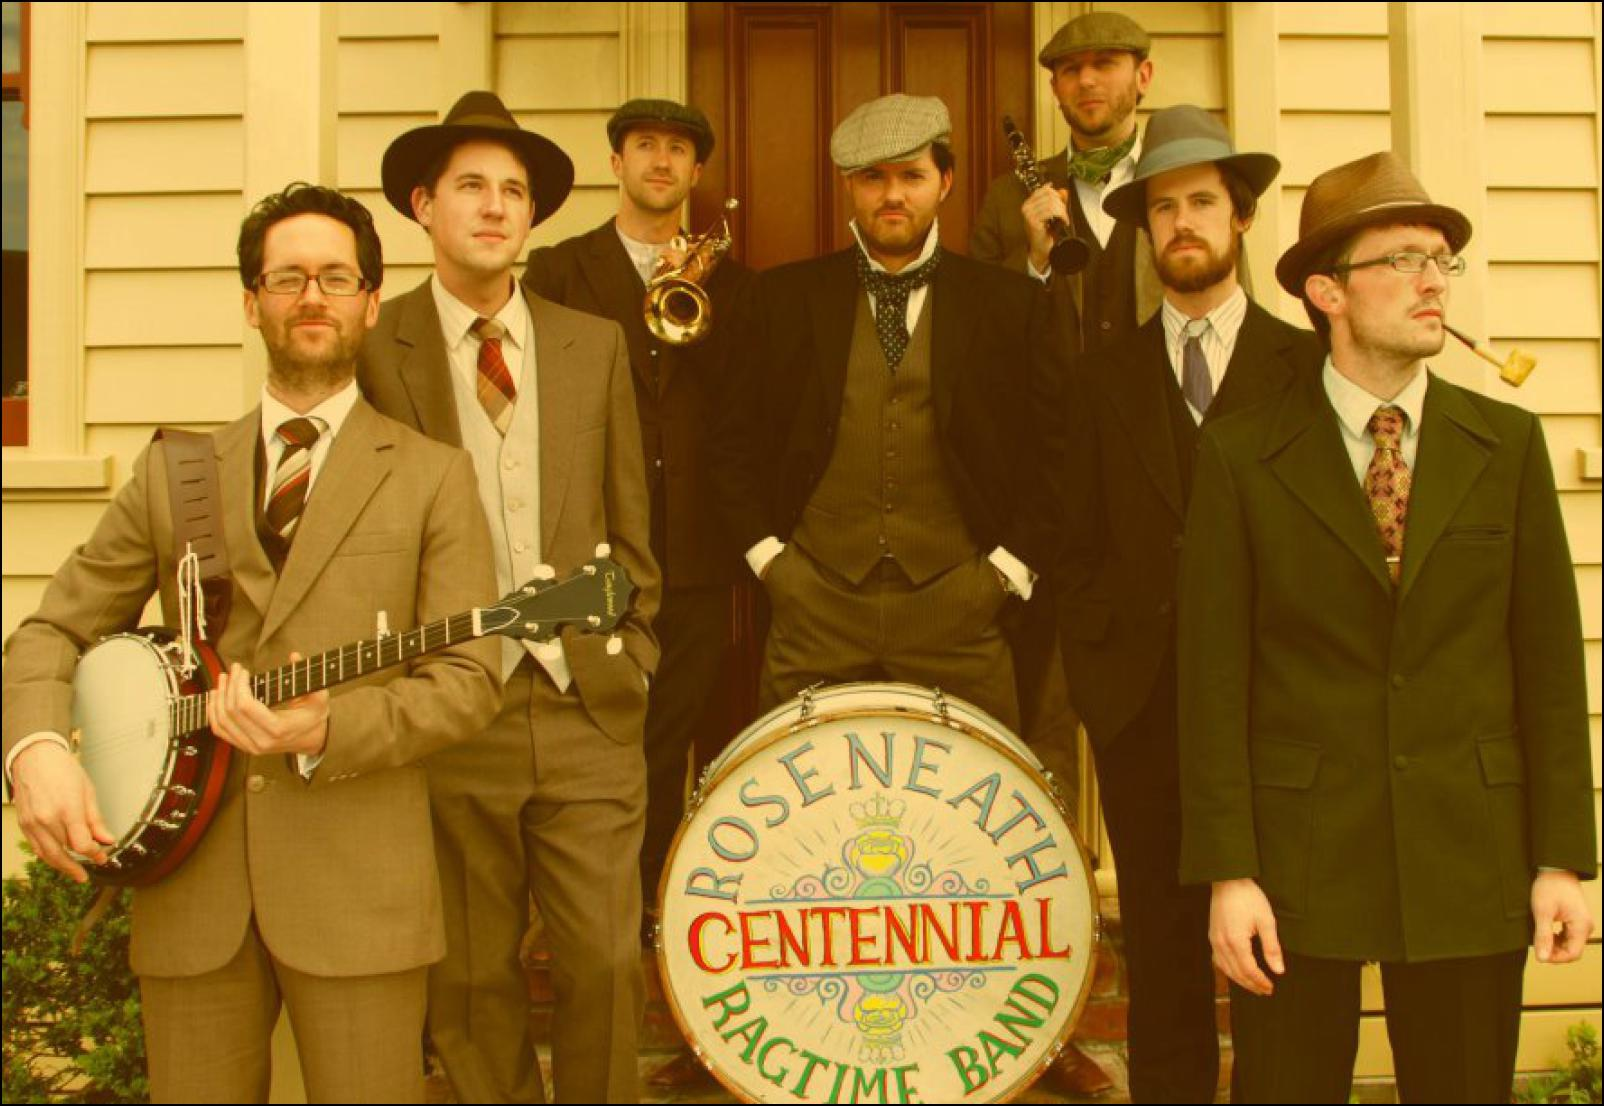 Wellington.scoop.co.nz » Garden Club: Roseneath Centennial Ragtime Band